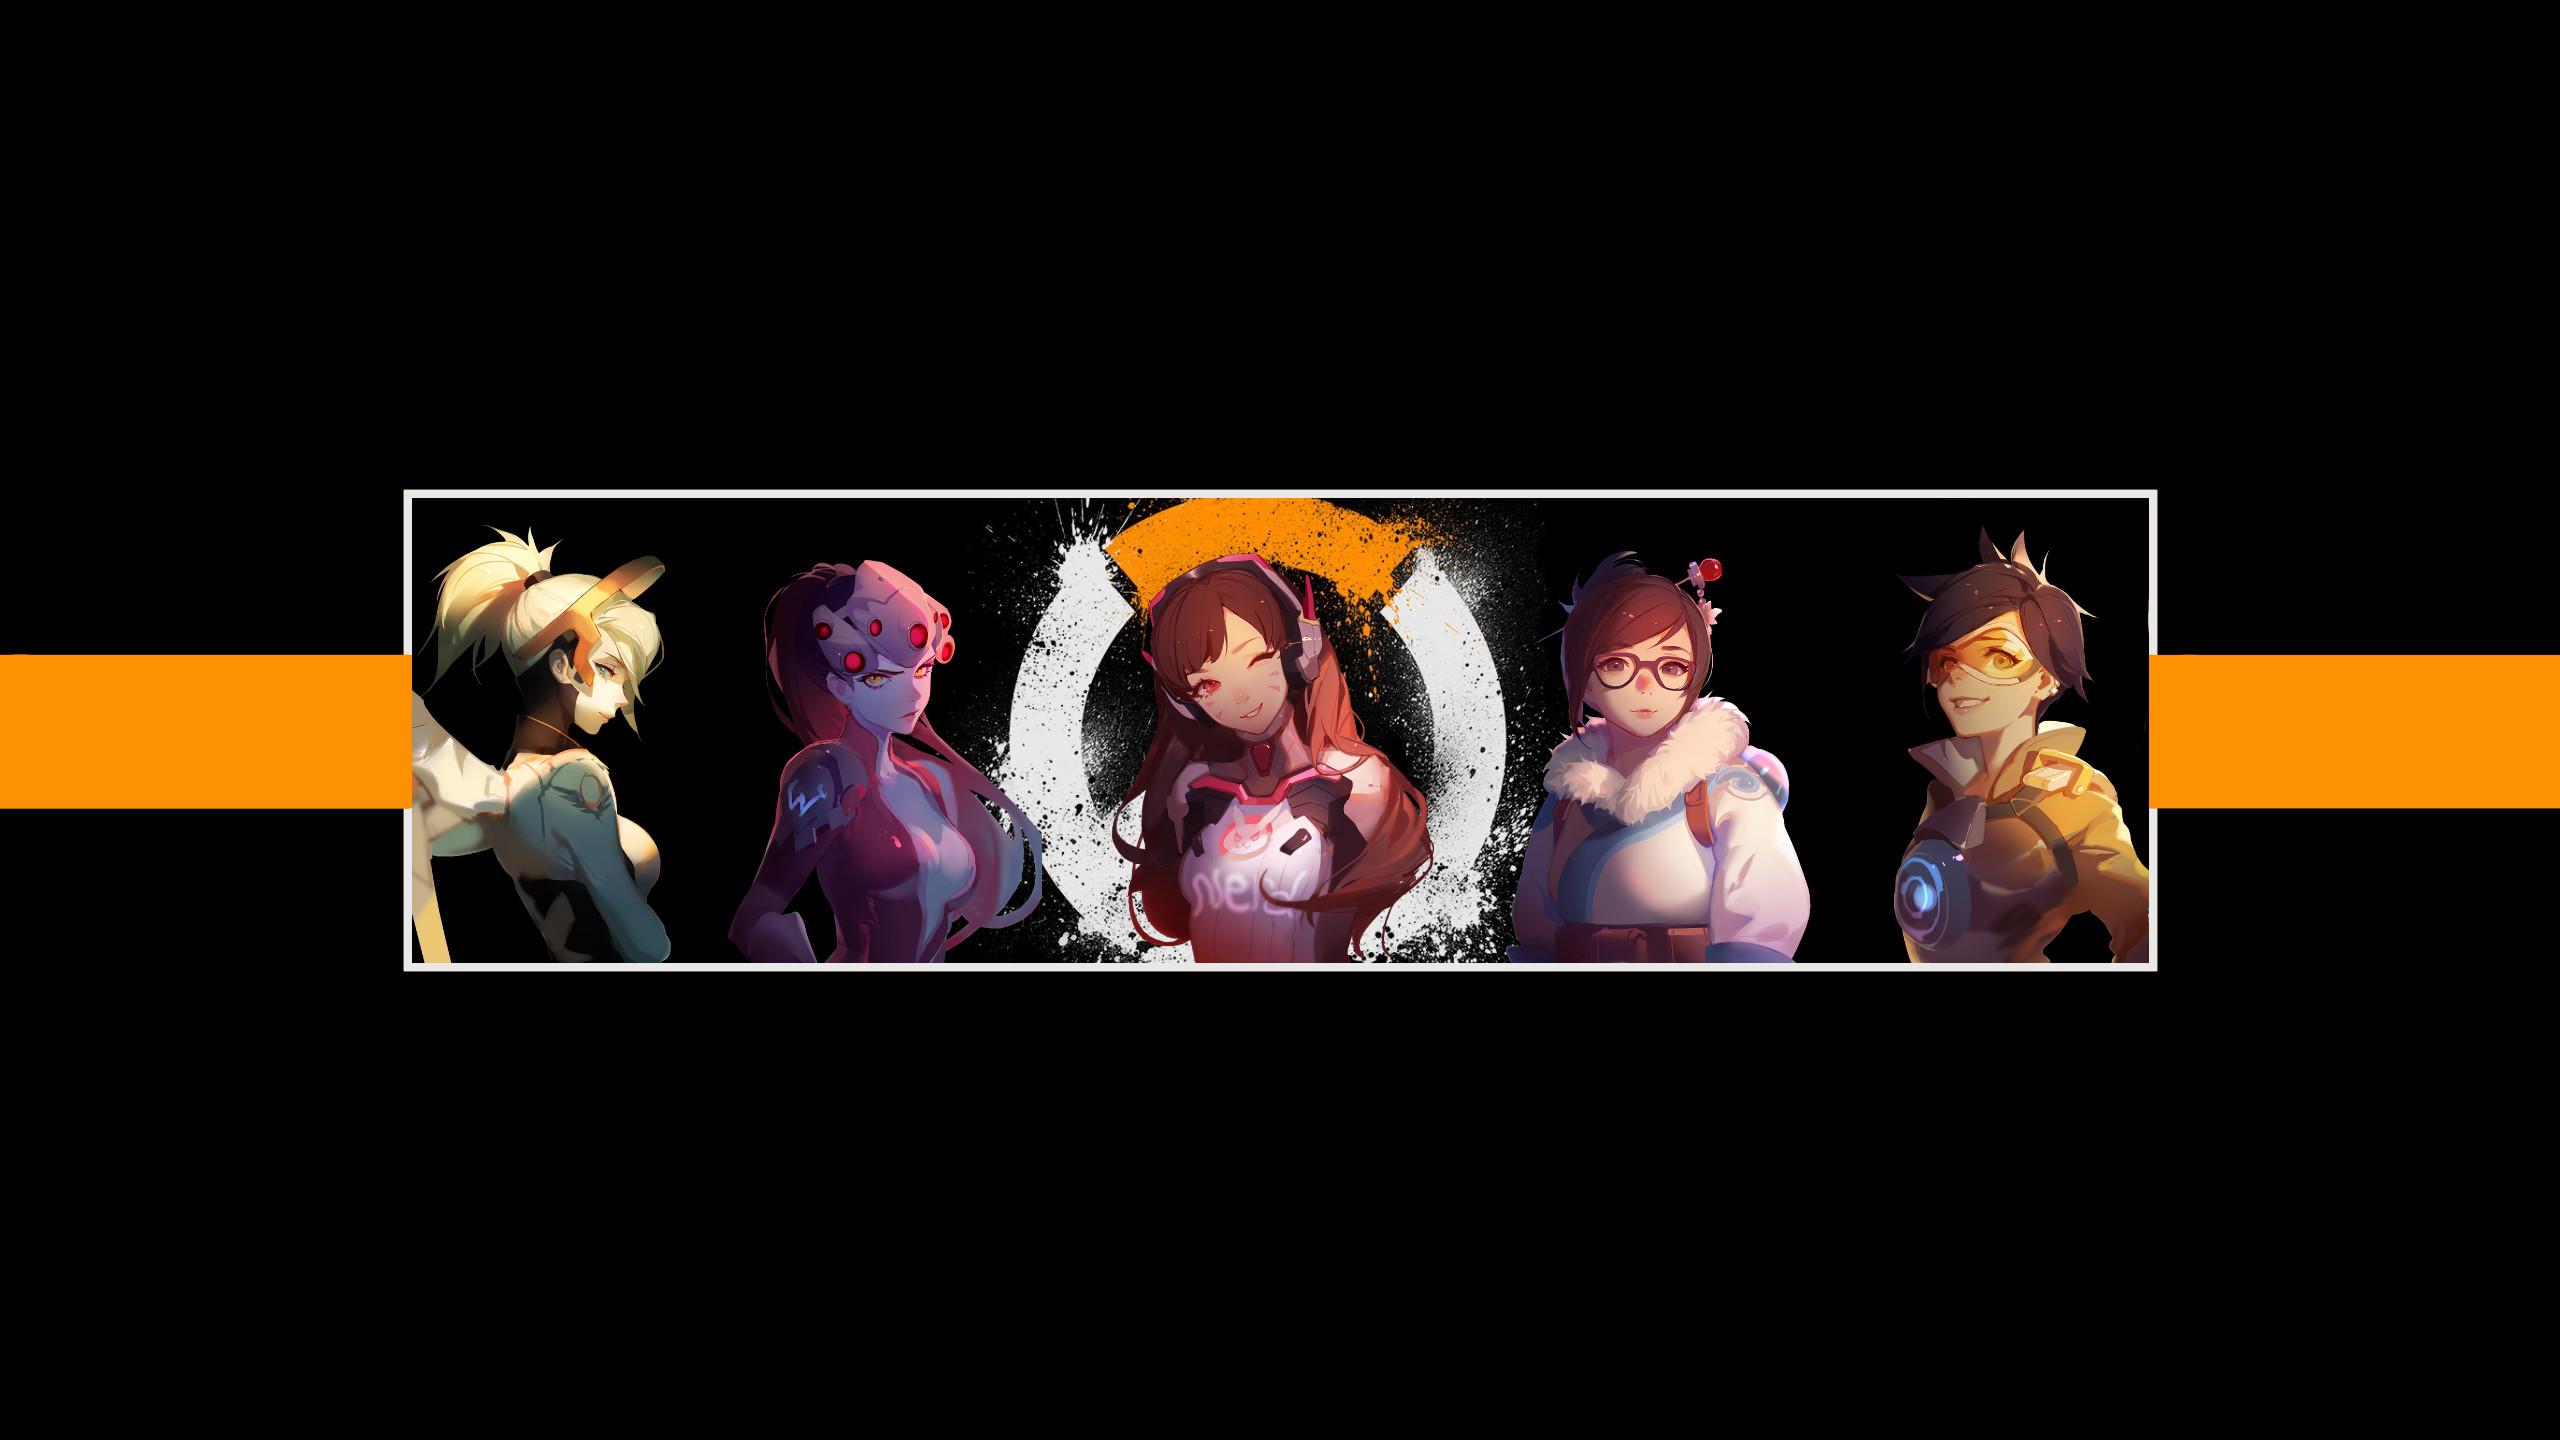 … Overwatch Girl Heroes Desktop Wallpaper – Nerd by Lowkey-Nerd